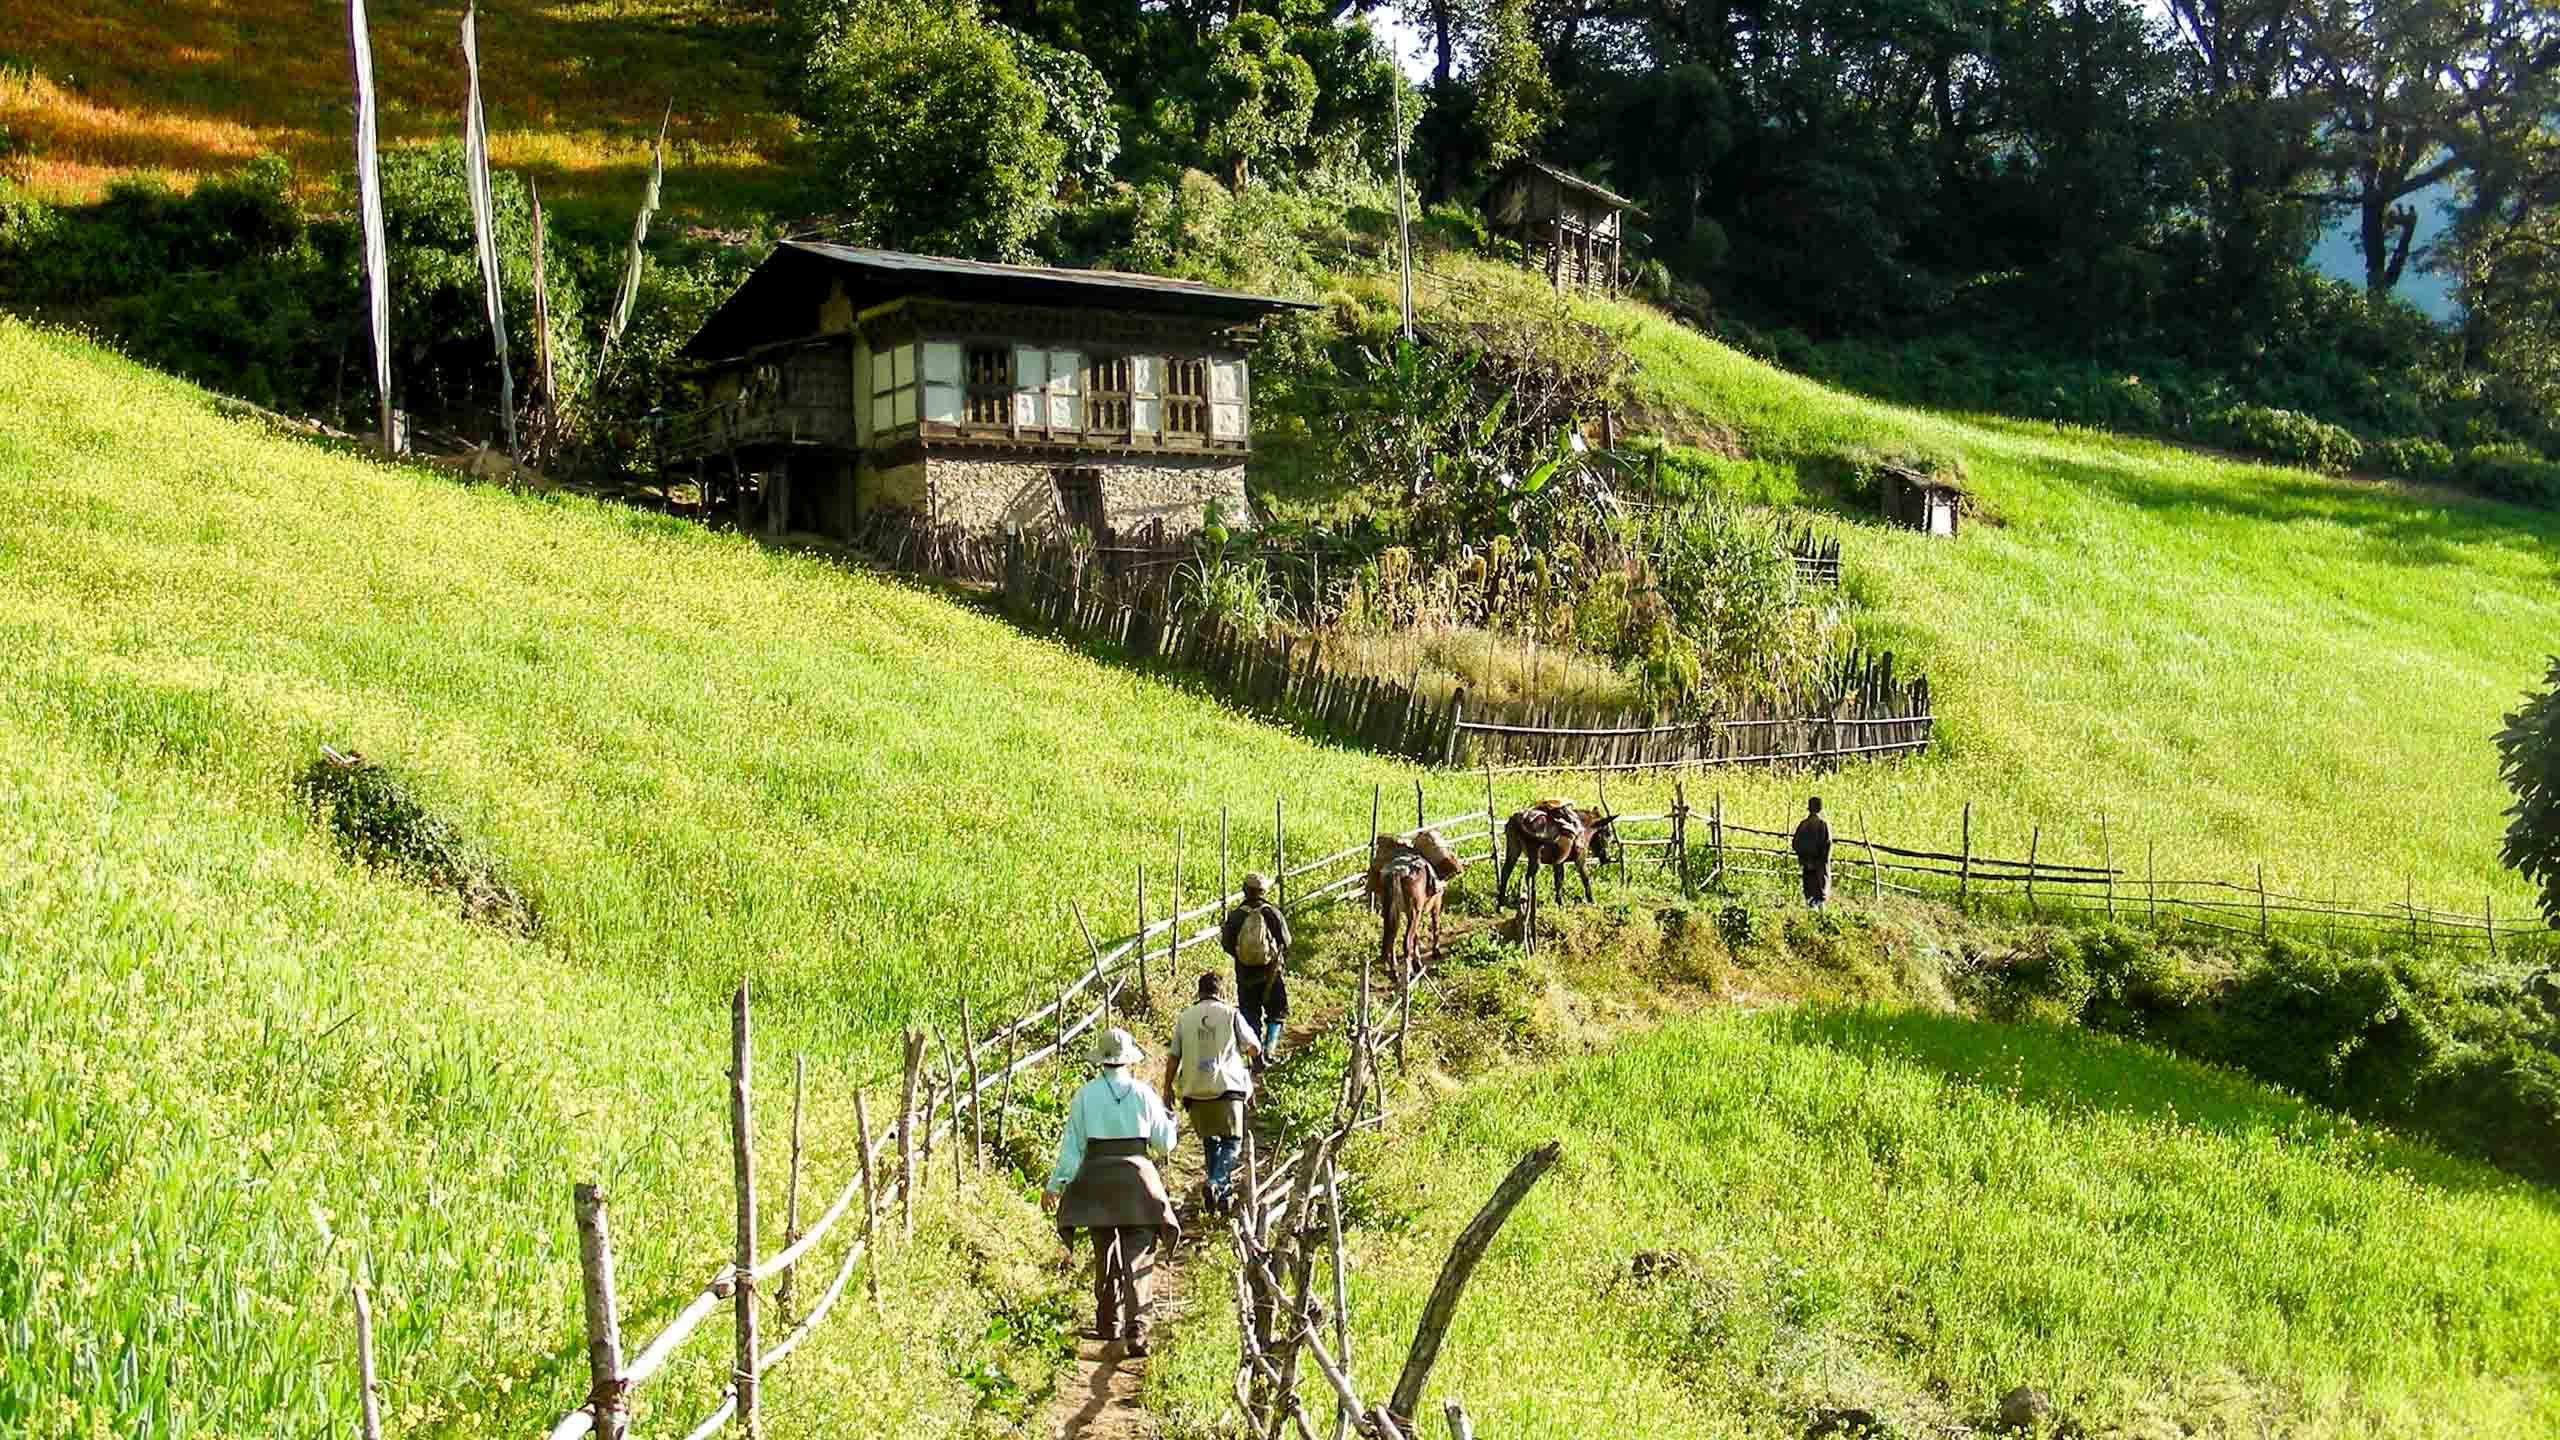 Hiking group walks through Bhutan valley